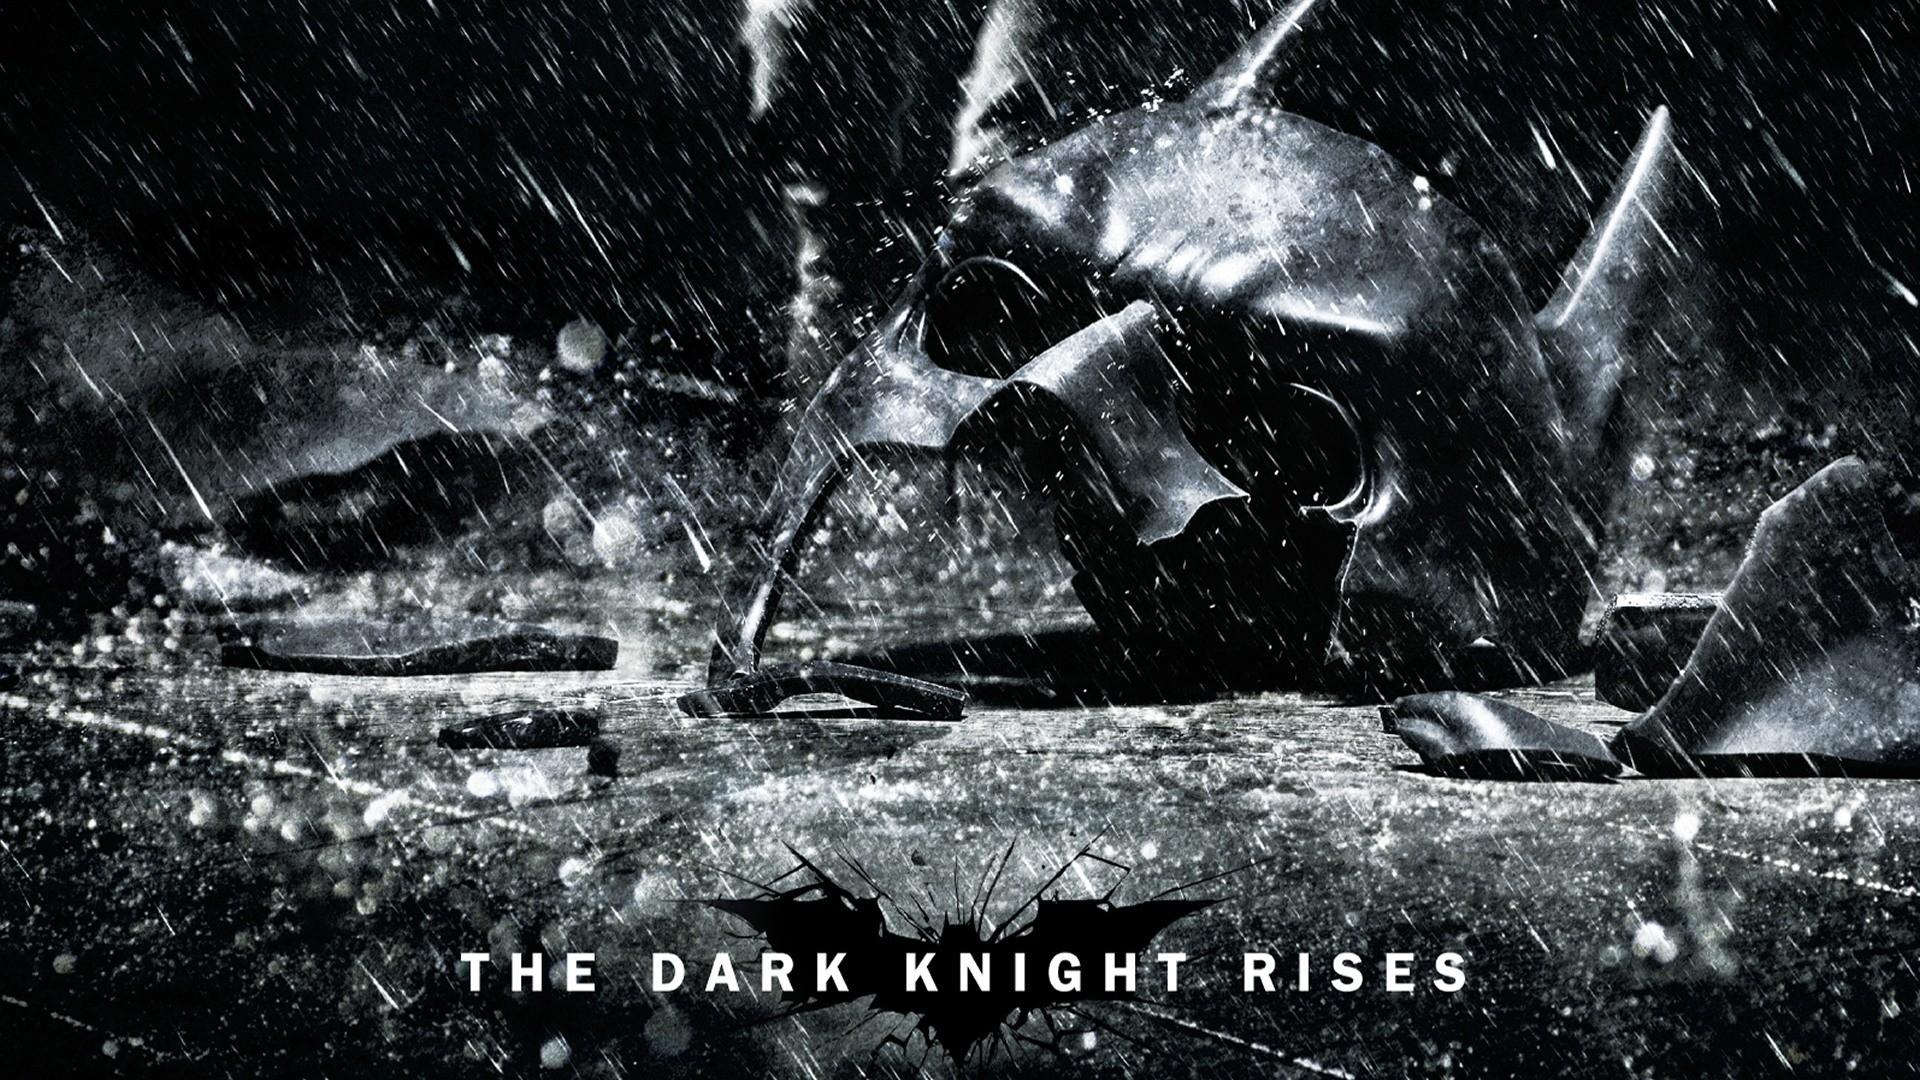 Batman hd wallpapers 1080p (61)